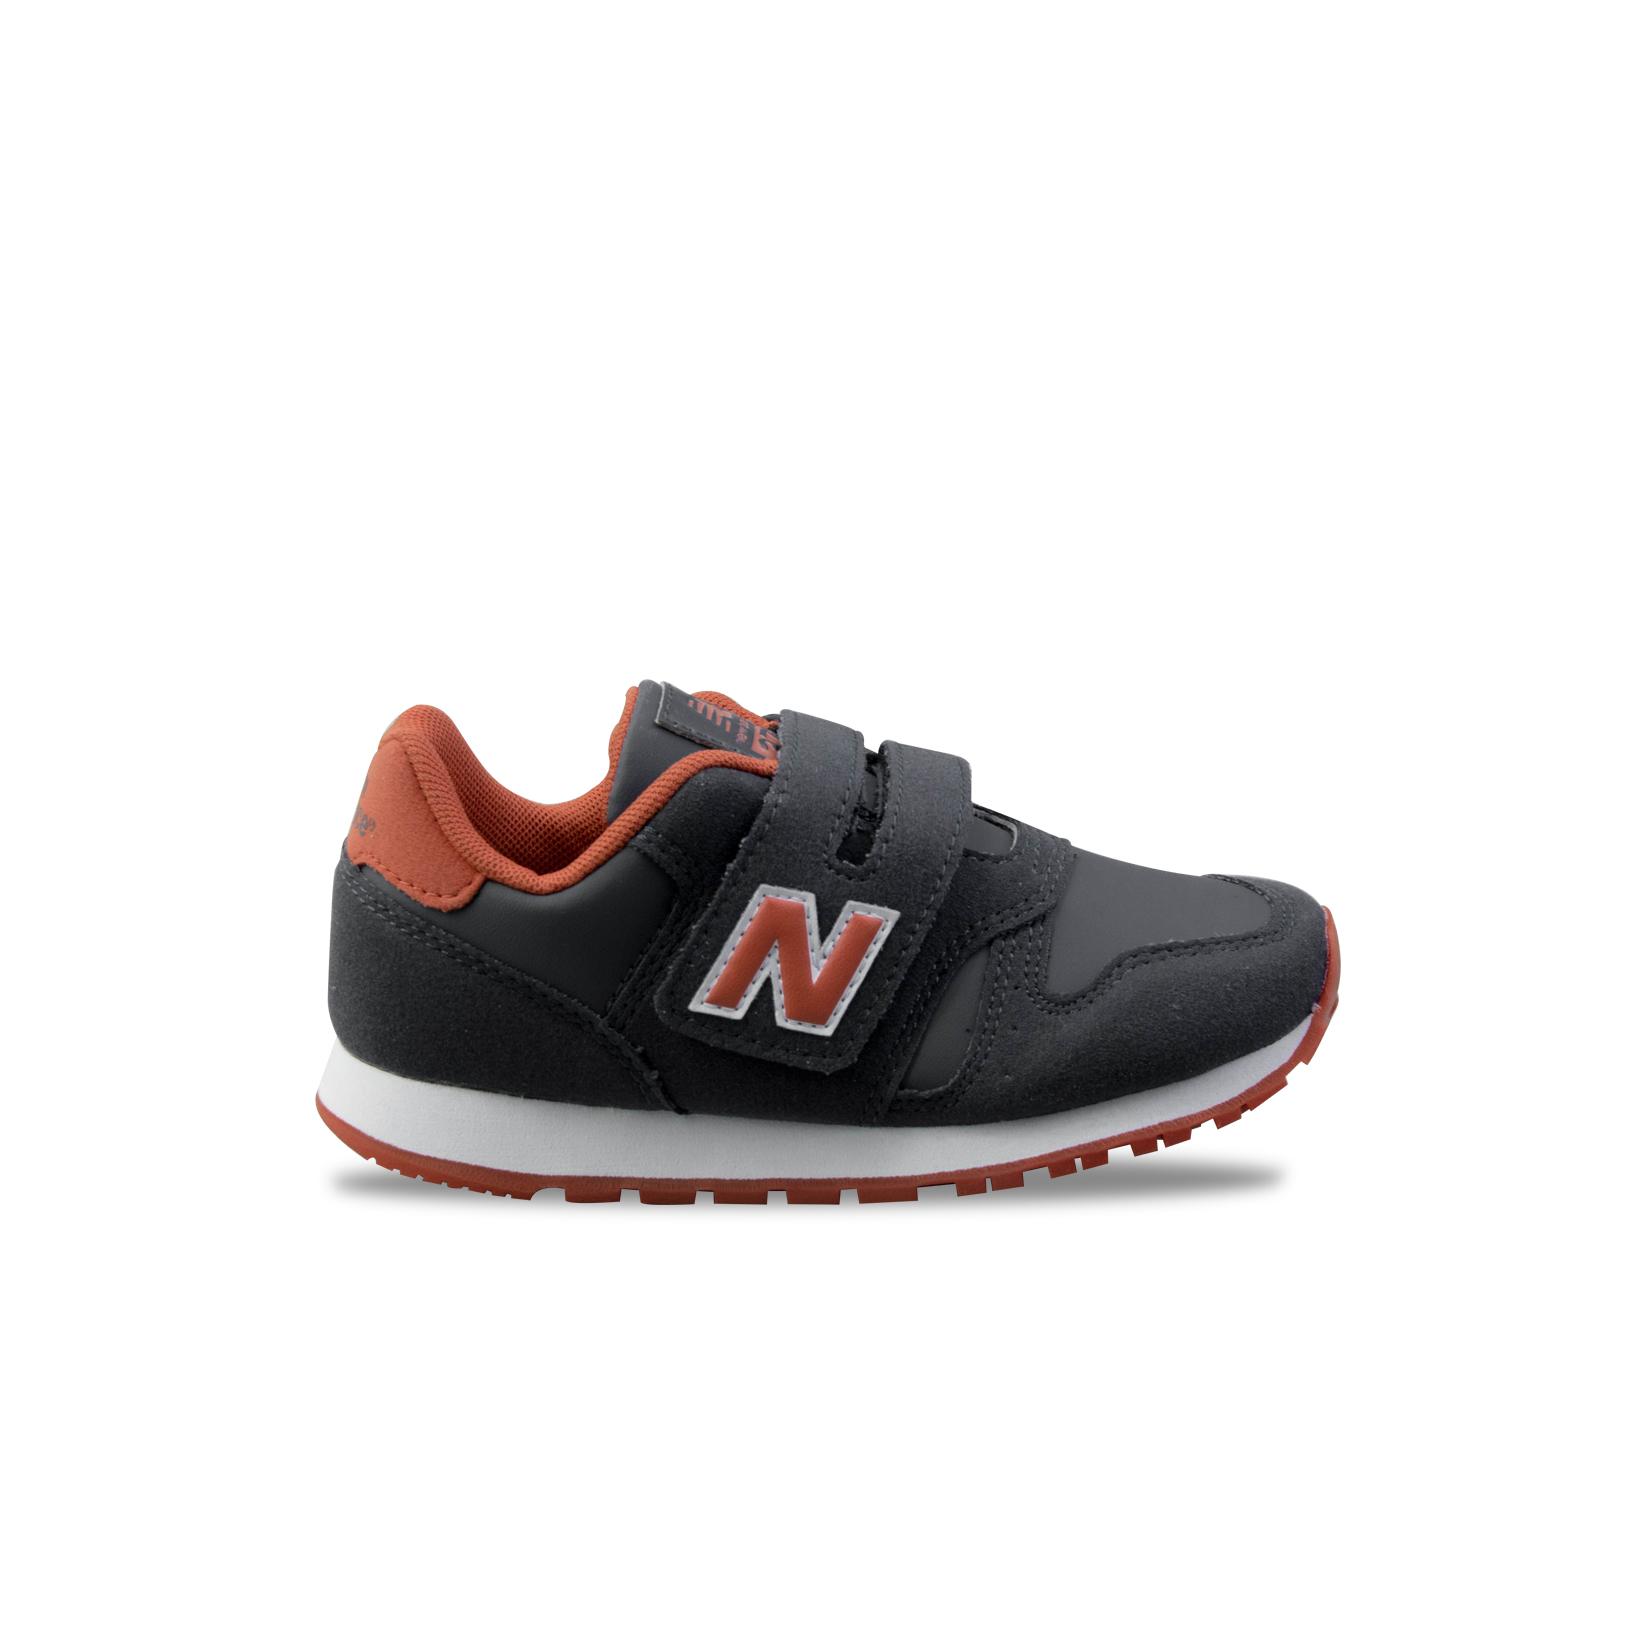 new product 97412 b71e3 Kid's Shoes New Balance 373 Grey / Dark Orange | All-Sports.gr